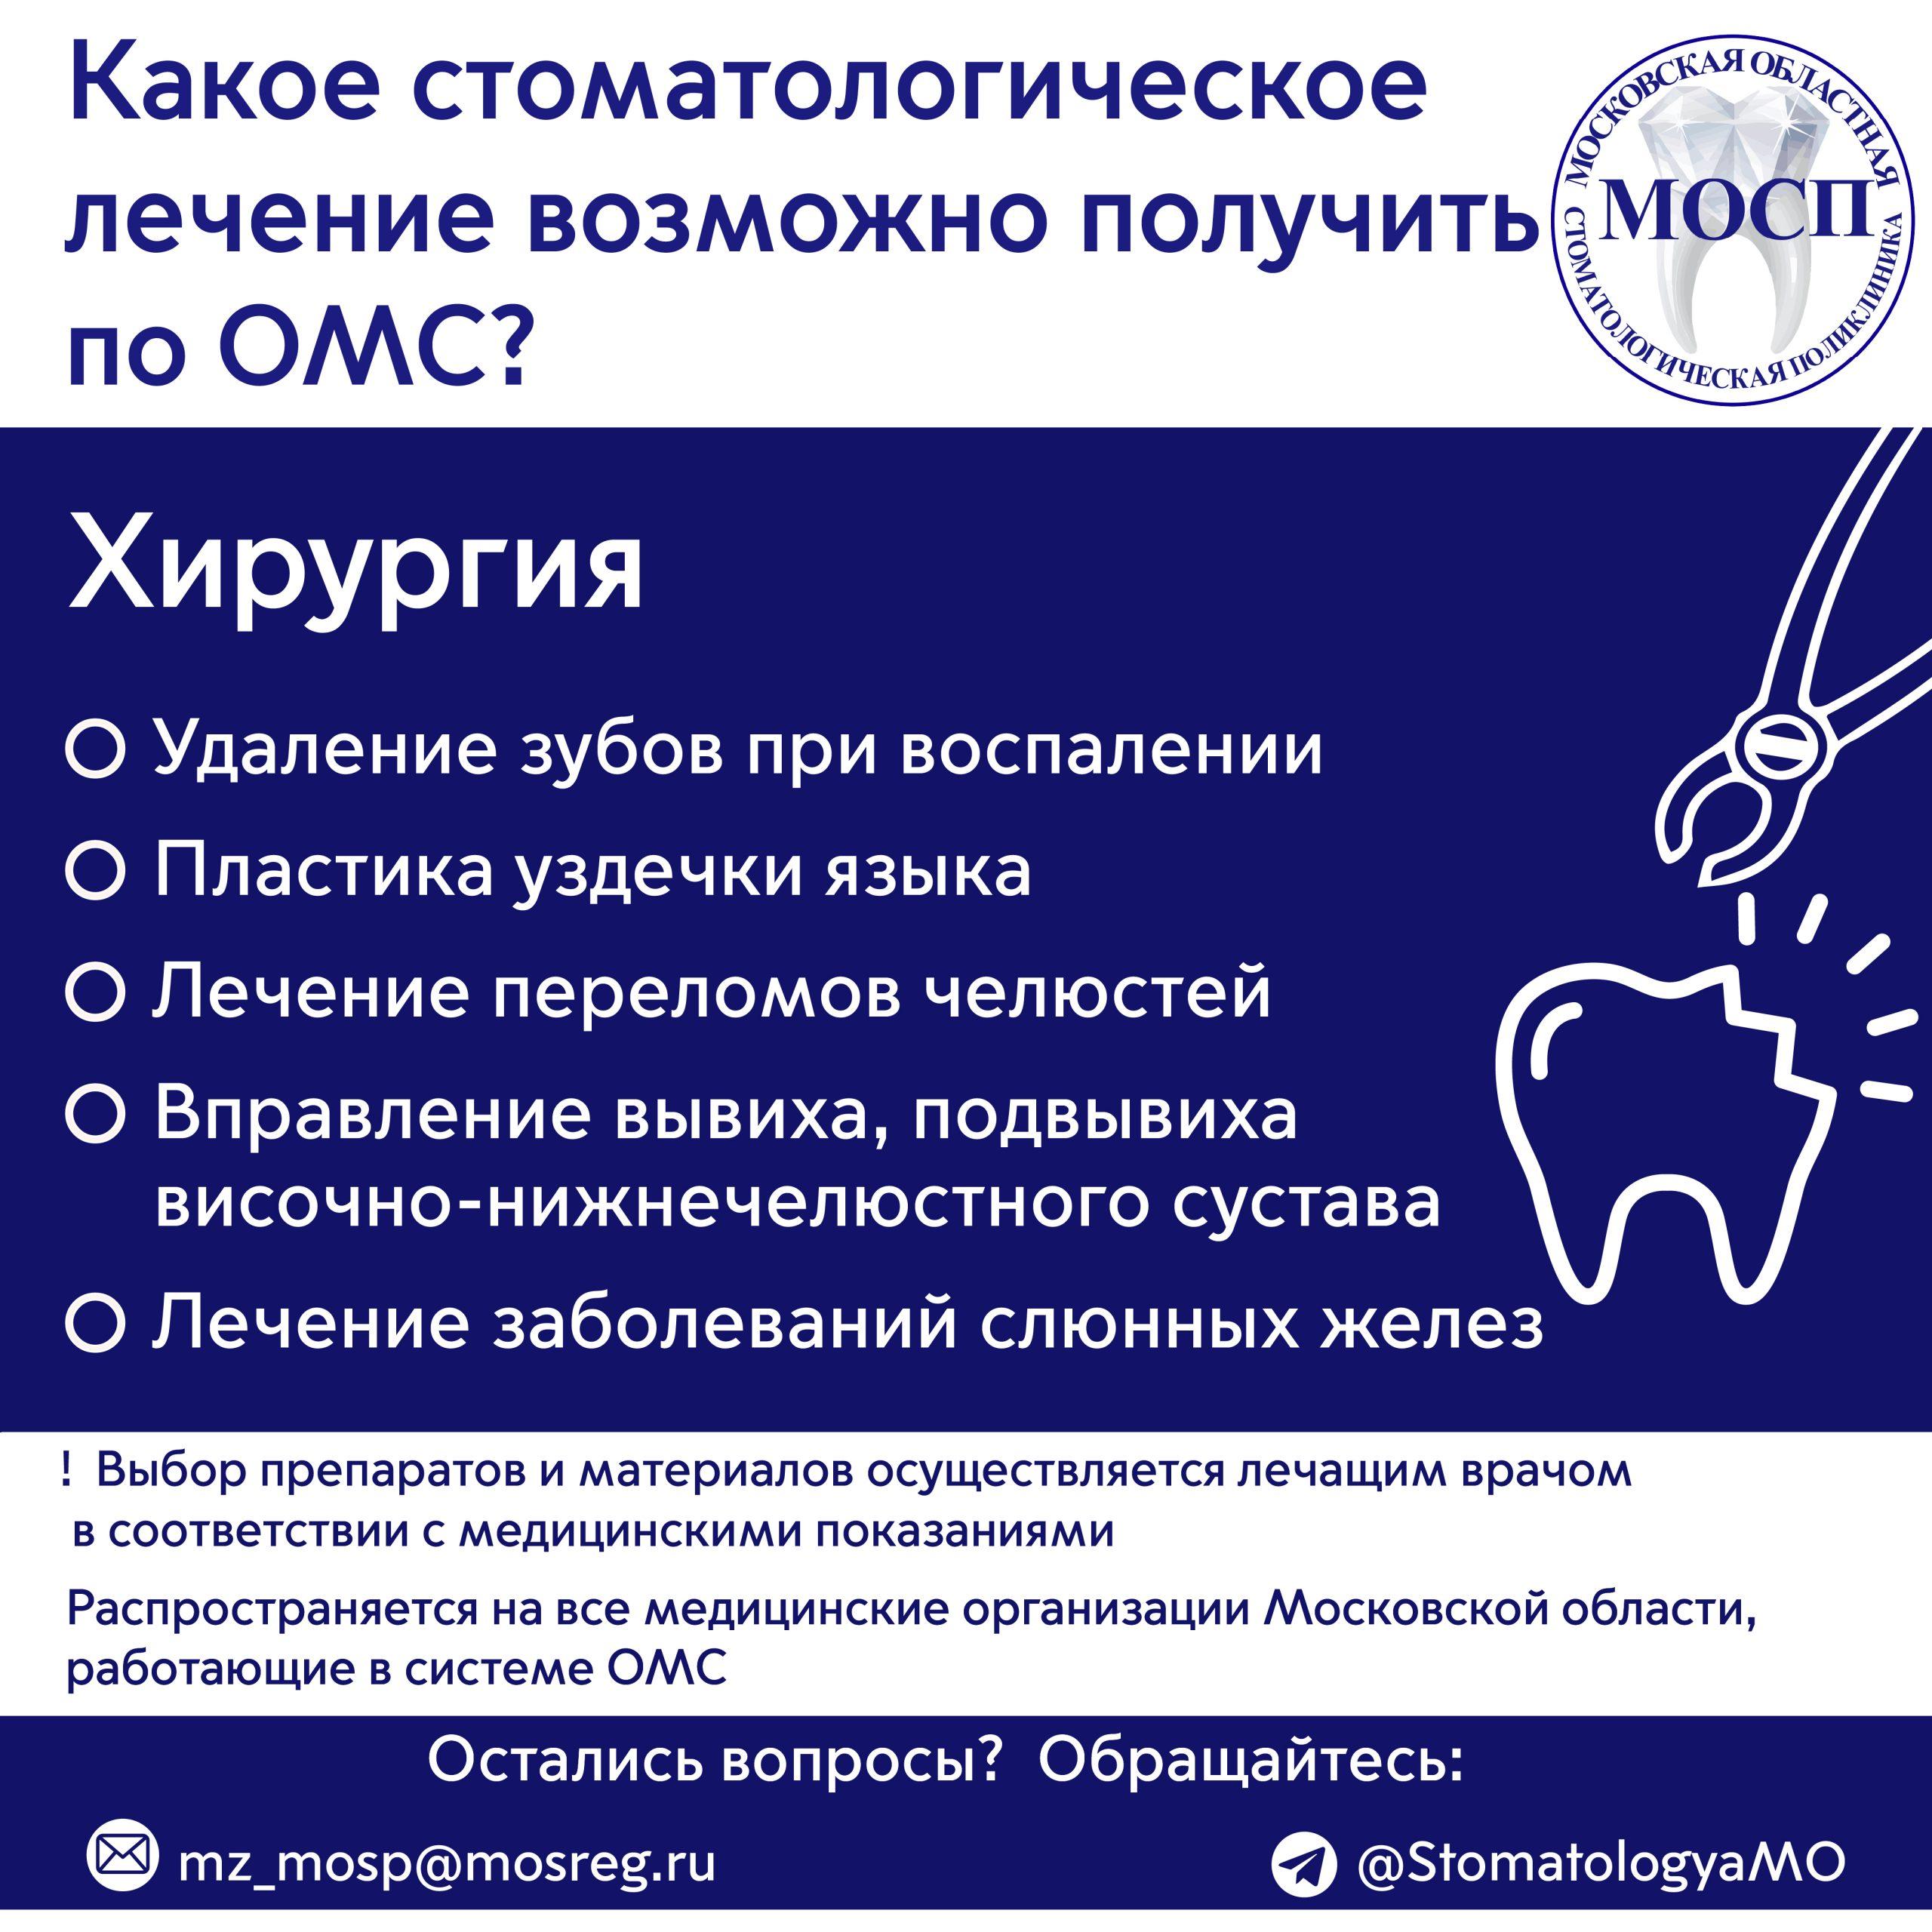 Памятка стоматология ОМС Хирургия